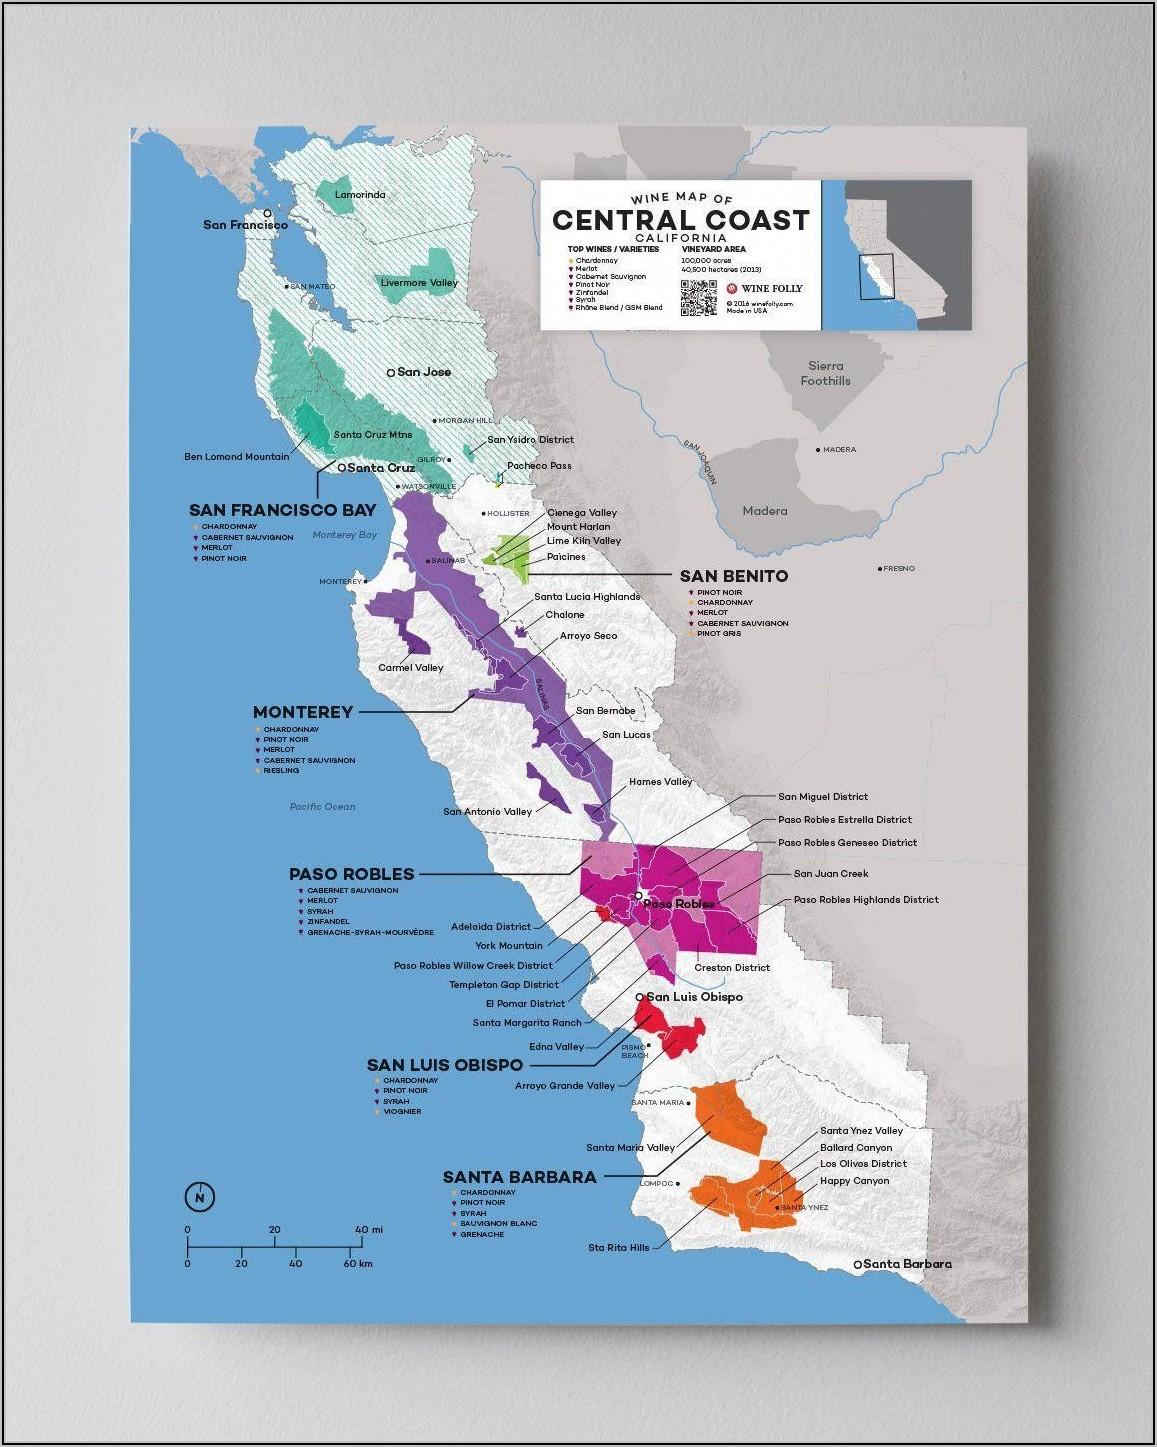 Temecula Wineries Map 2019